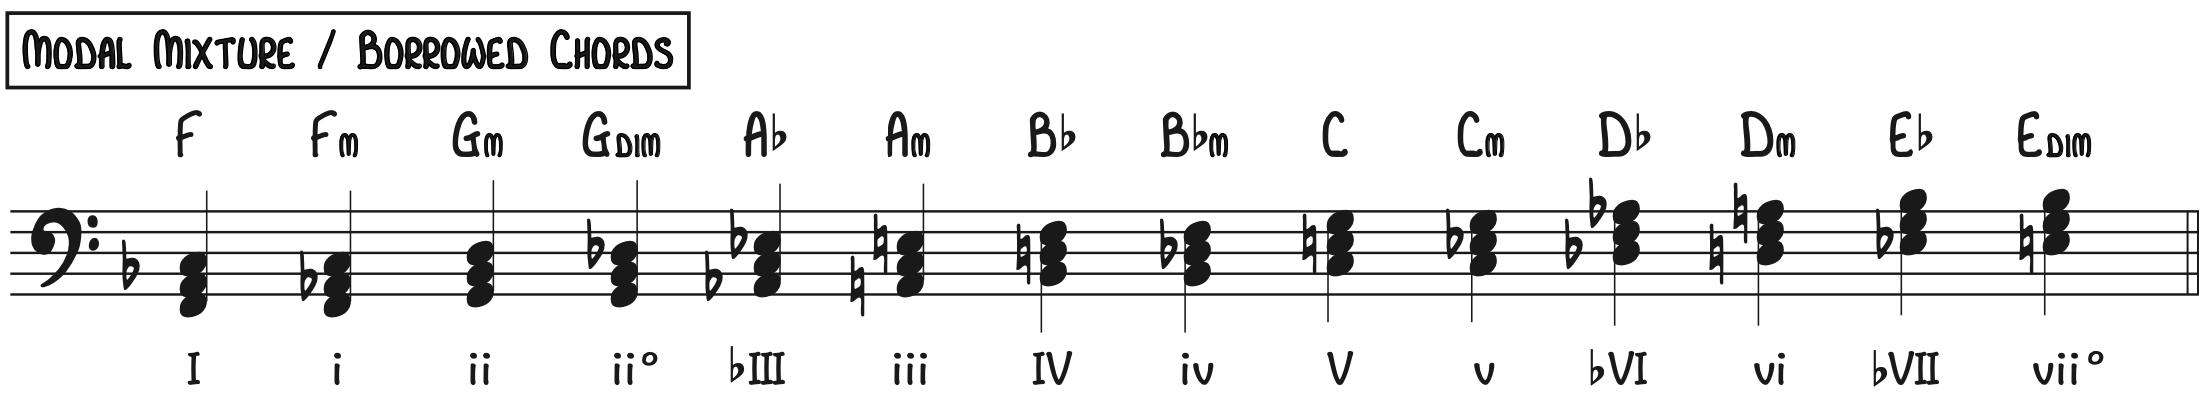 Modal Mixture or Borrowed Chords Mode Interchange piano